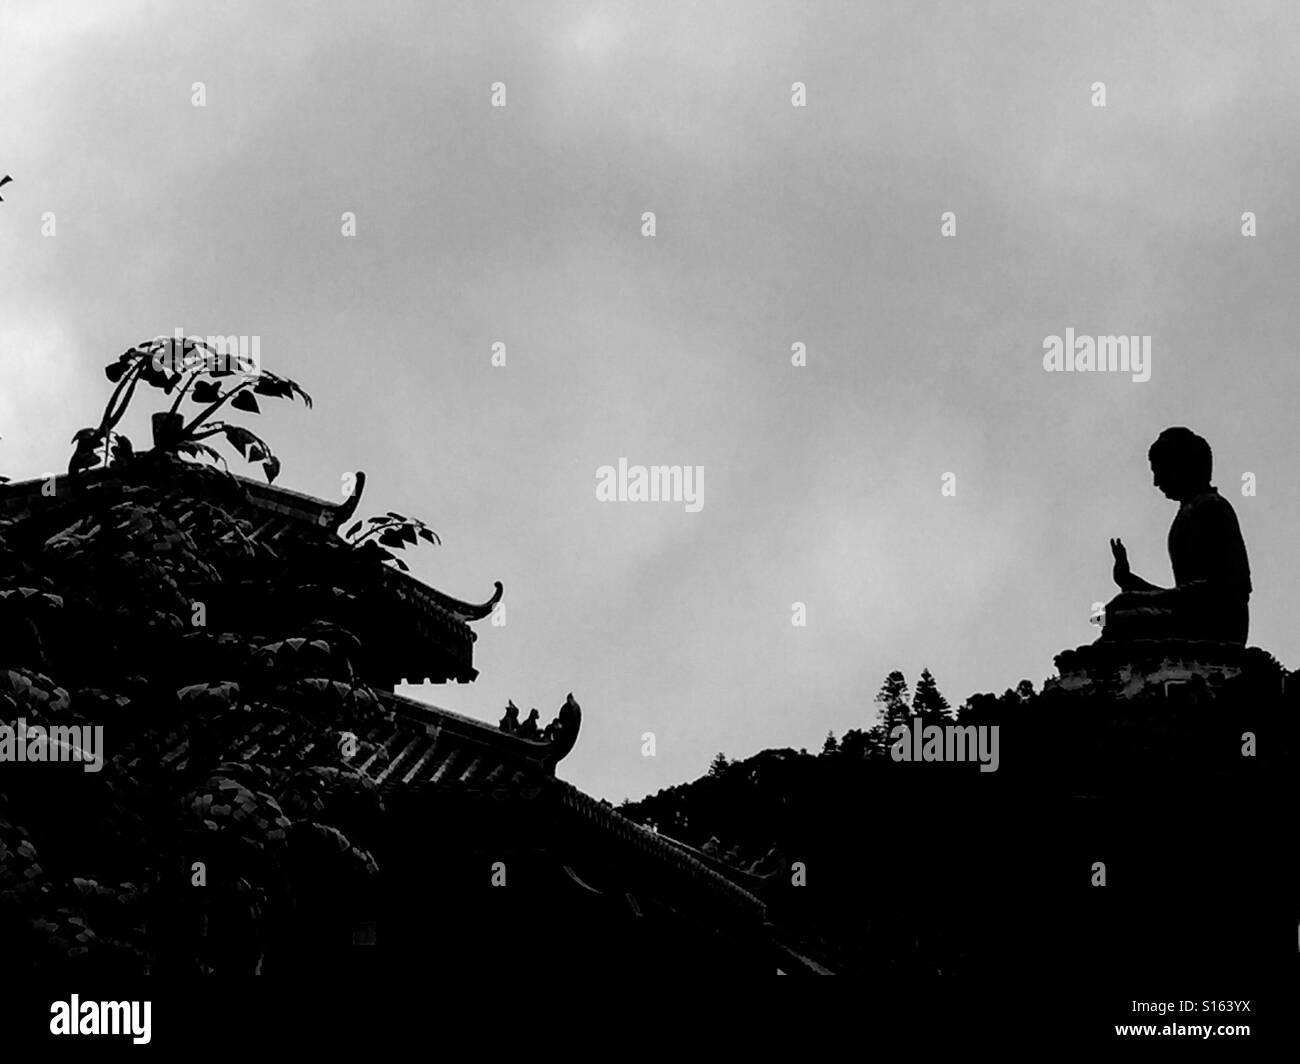 The big Buddha - Stock Image